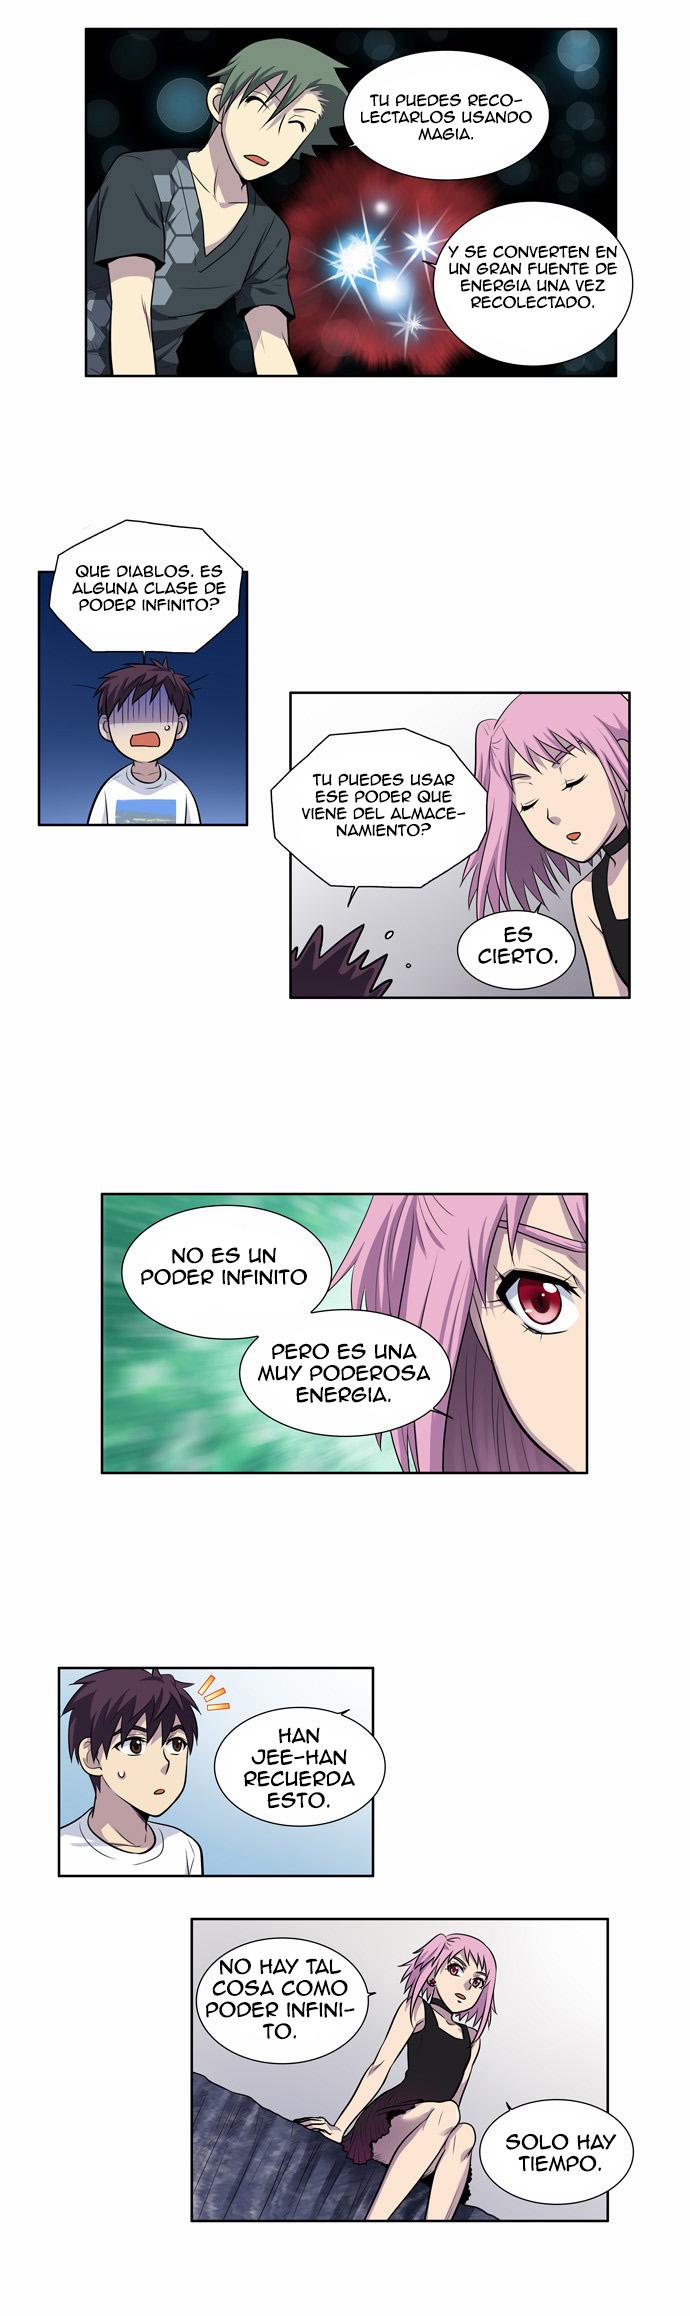 https://c5.ninemanga.com/es_manga/61/1725/415025/d82dcce748db2b286c31075d899273b0.jpg Page 16